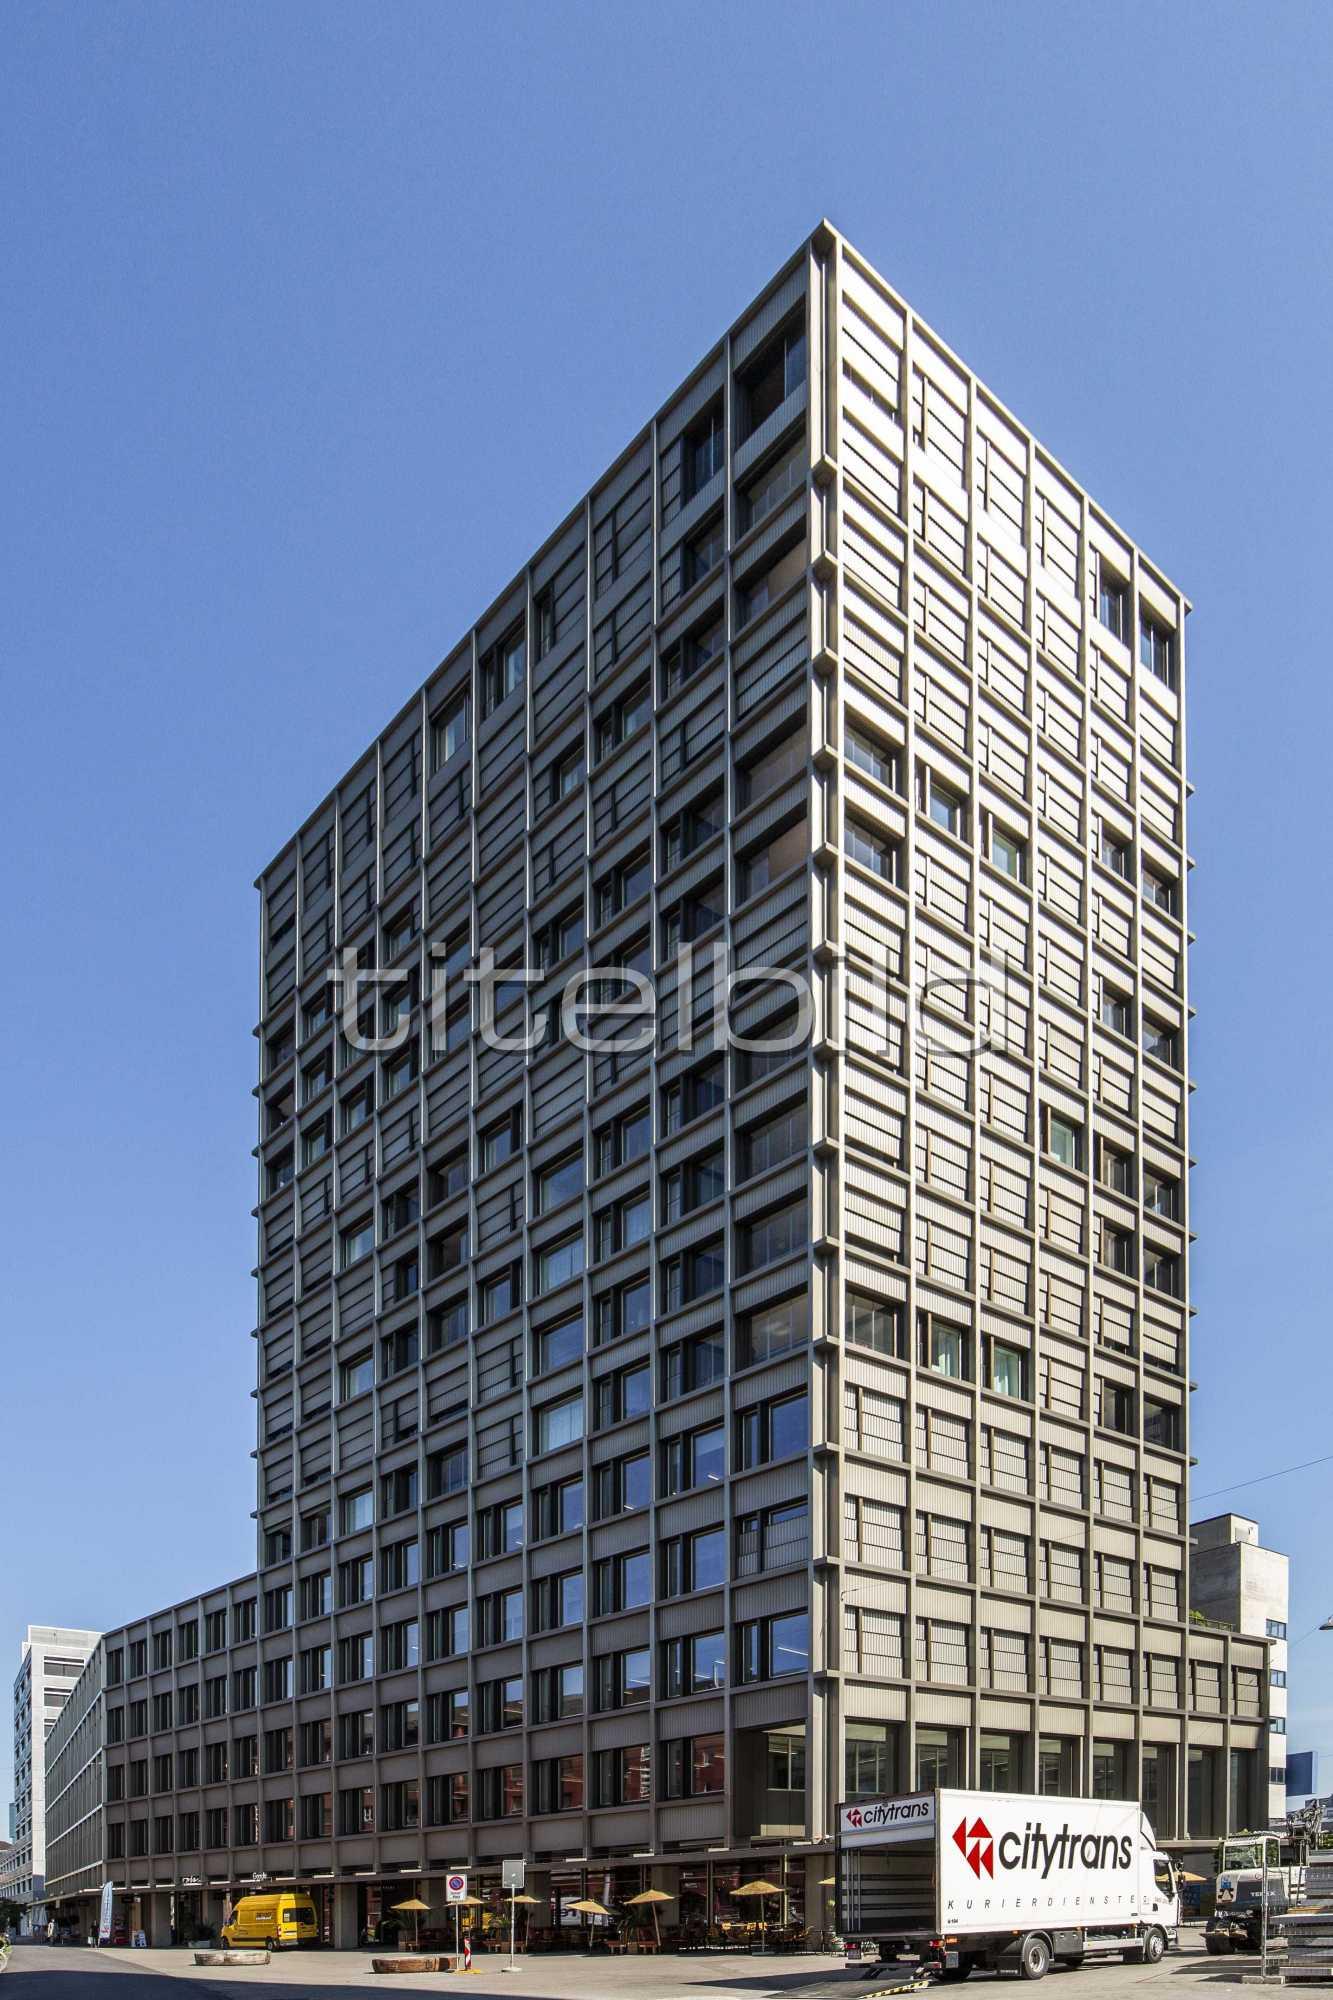 Projektbild-Nr. 2: Europaallee Baufeld G